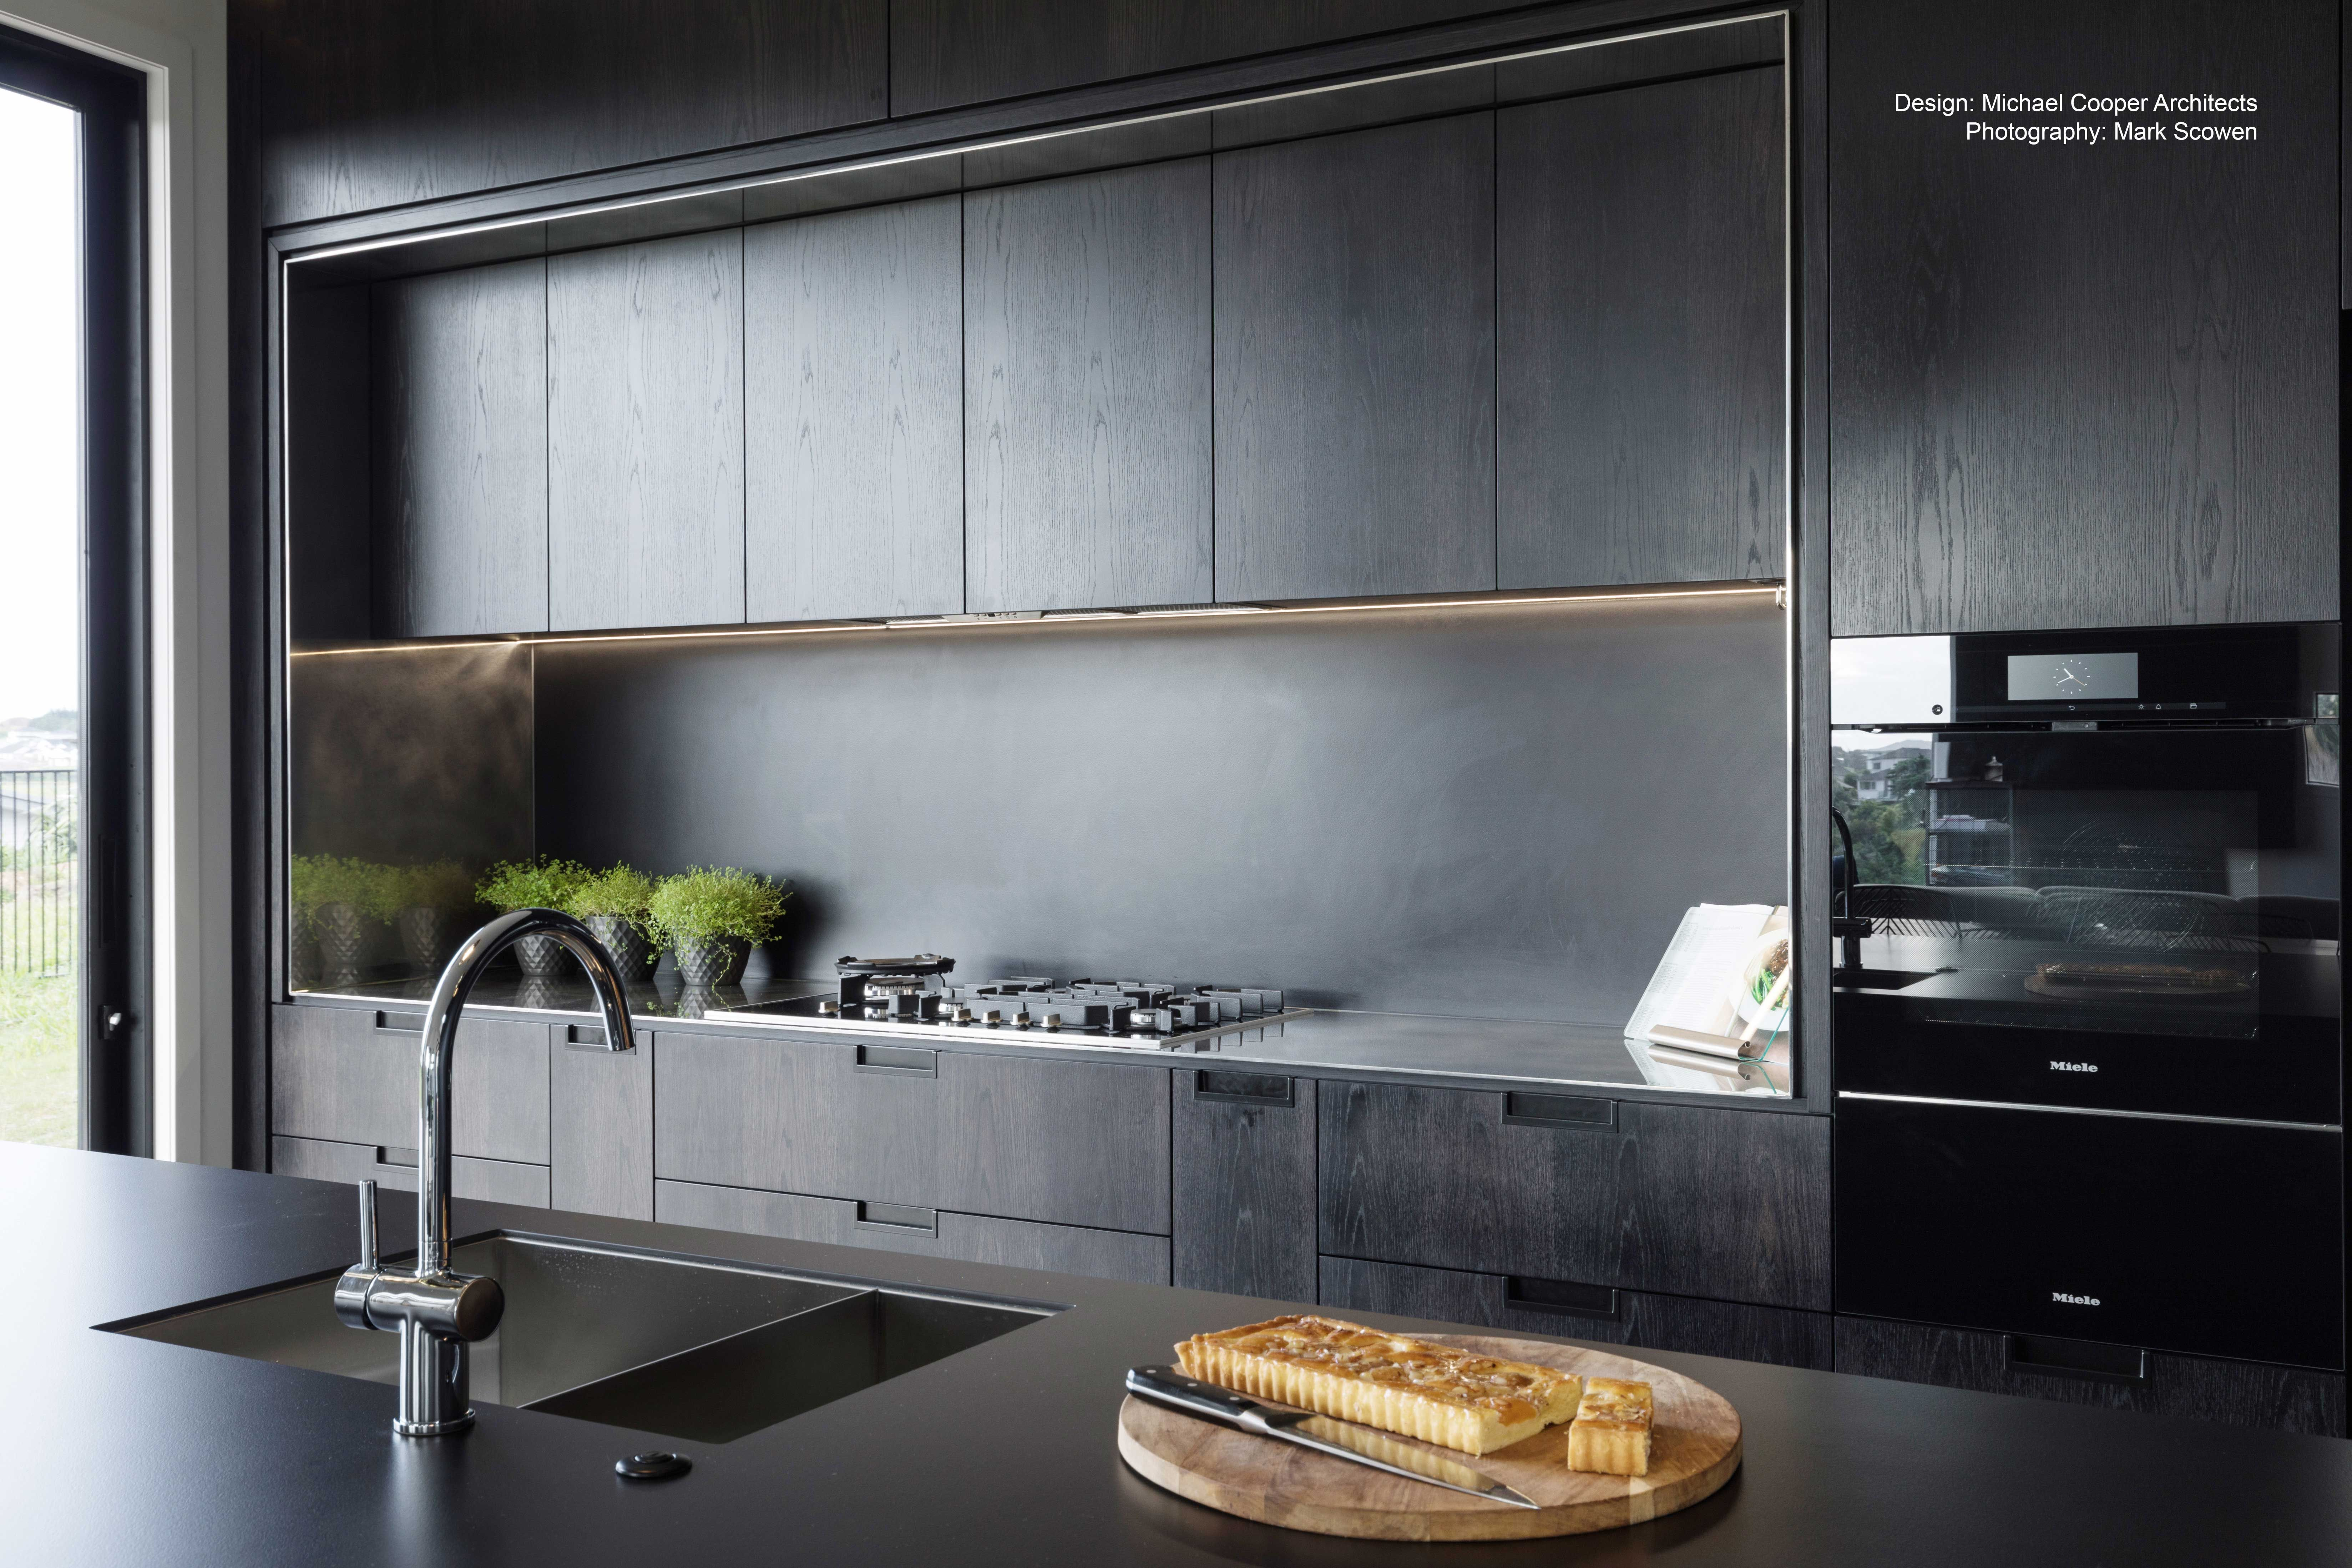 Matt Black Cabinetry And Splashback Create Chic Dark Kitchen ...